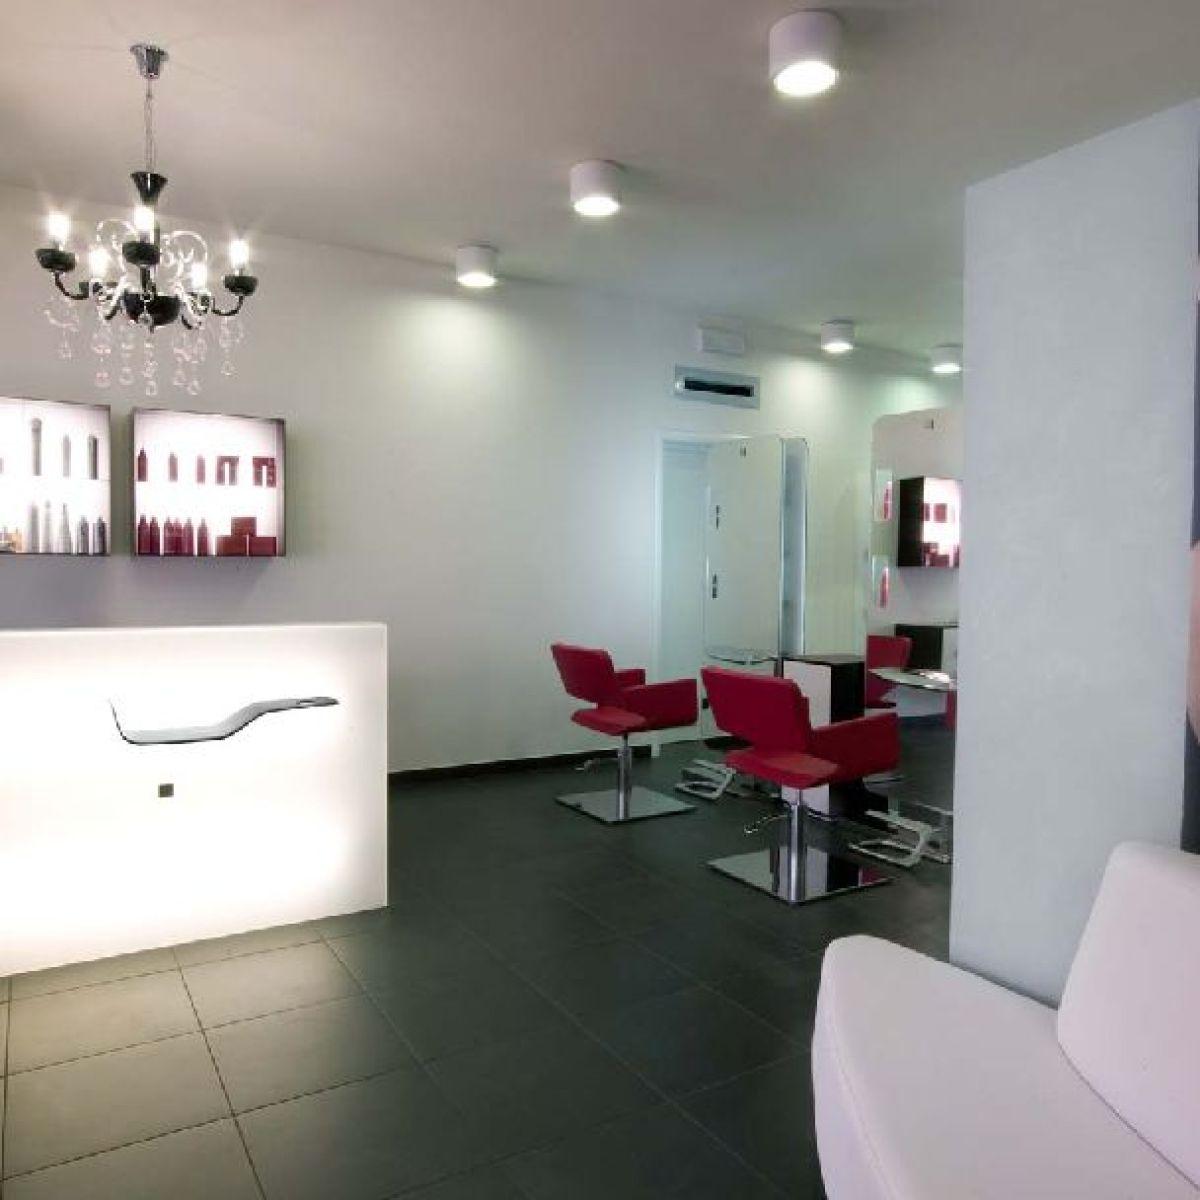 nelson mobilier fabricante mobiliaro para peluquieras made in france mobiliaro para. Black Bedroom Furniture Sets. Home Design Ideas